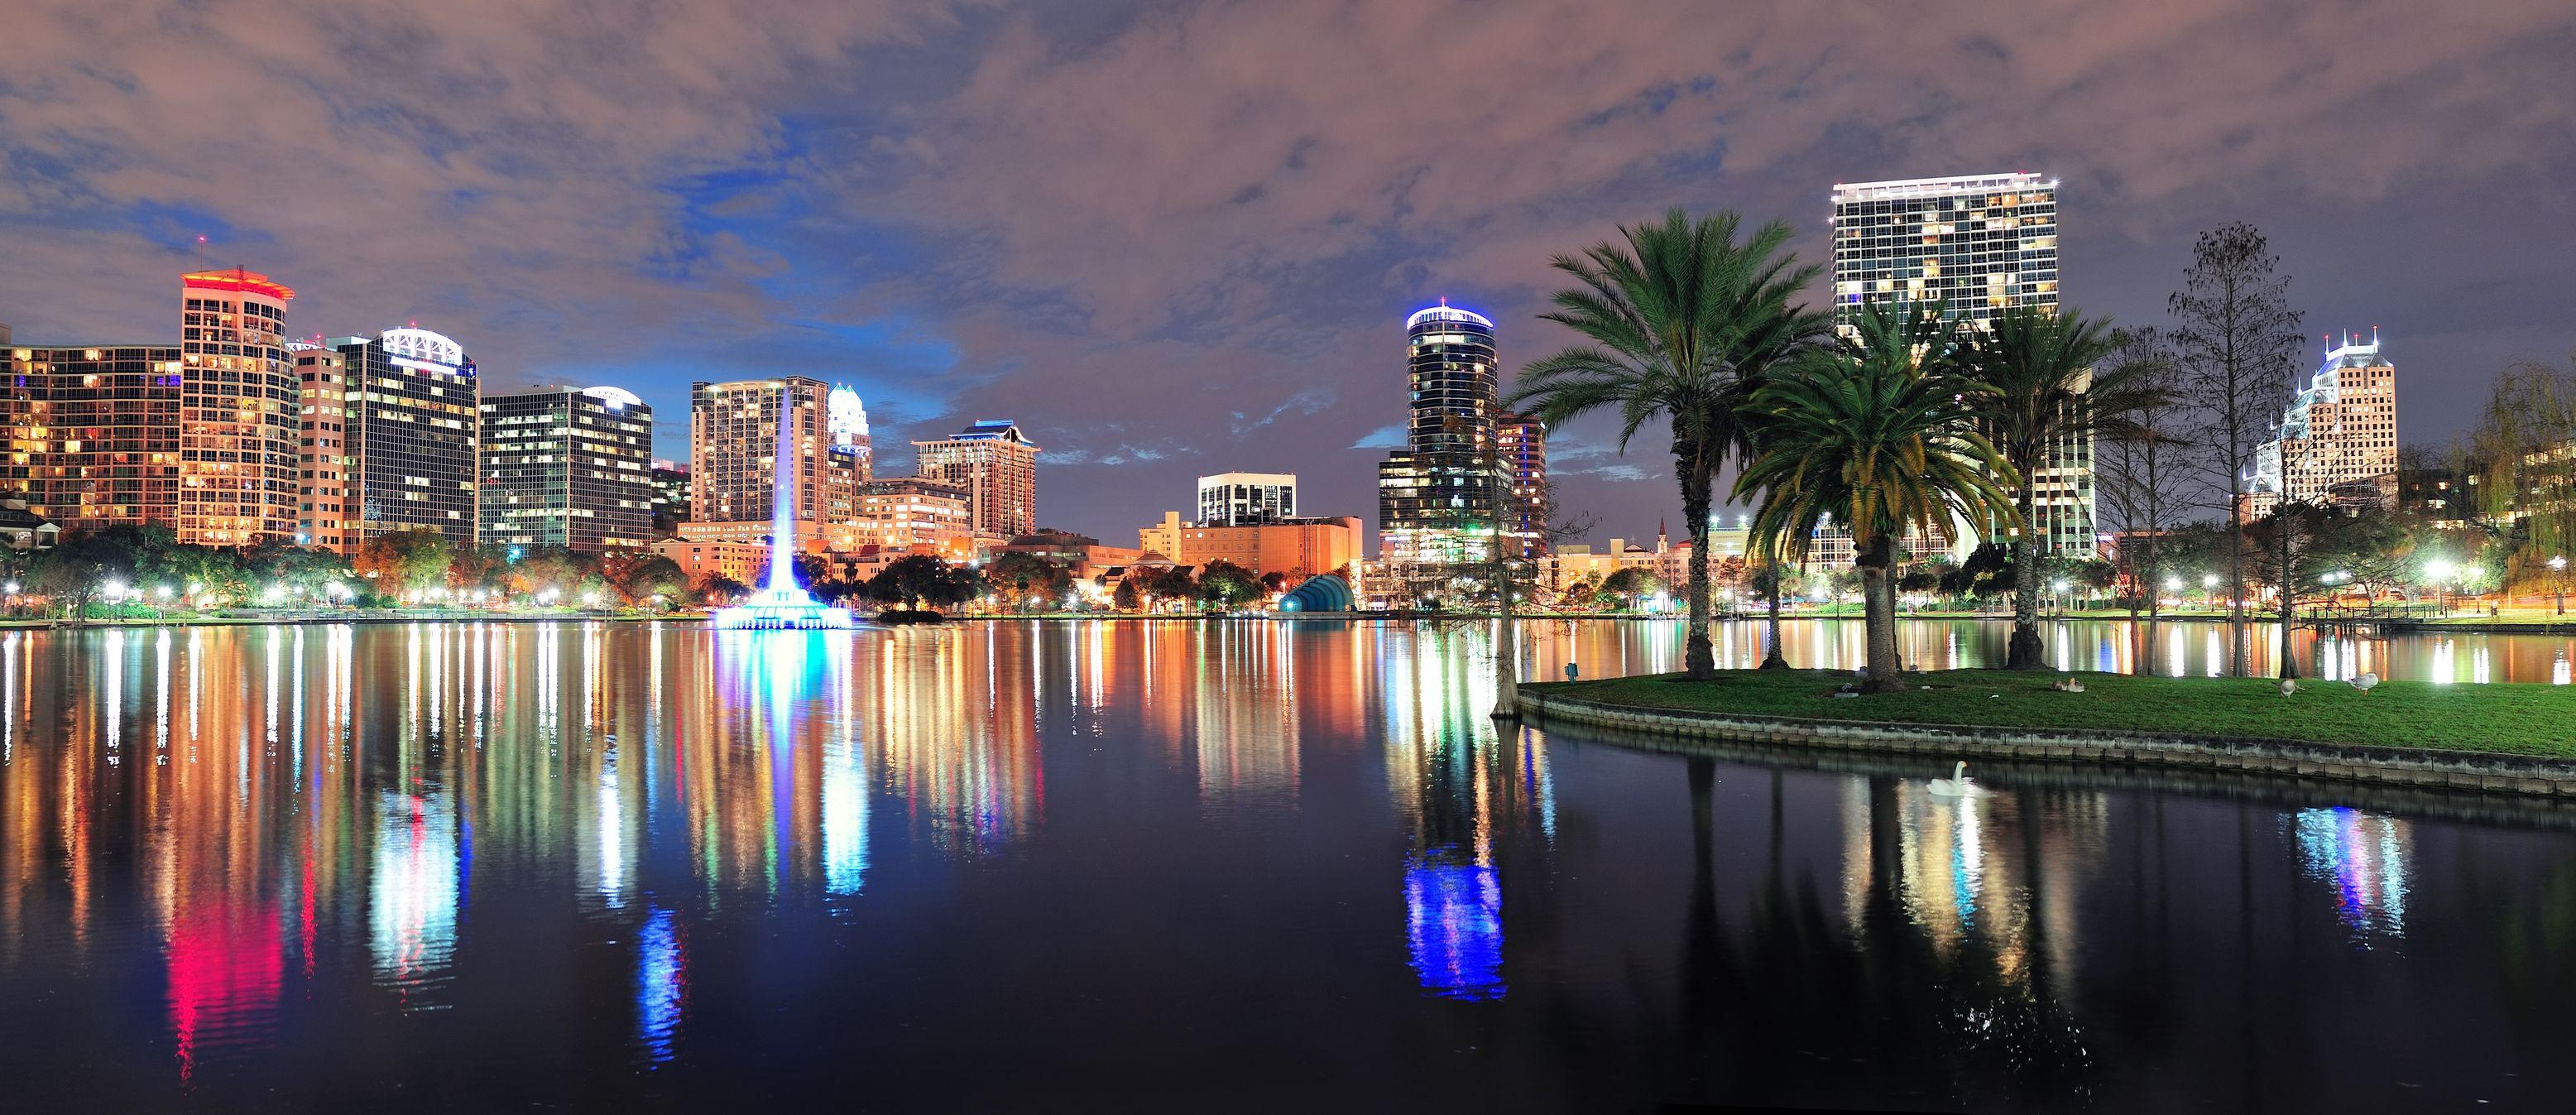 1465379068439_Orlando-f